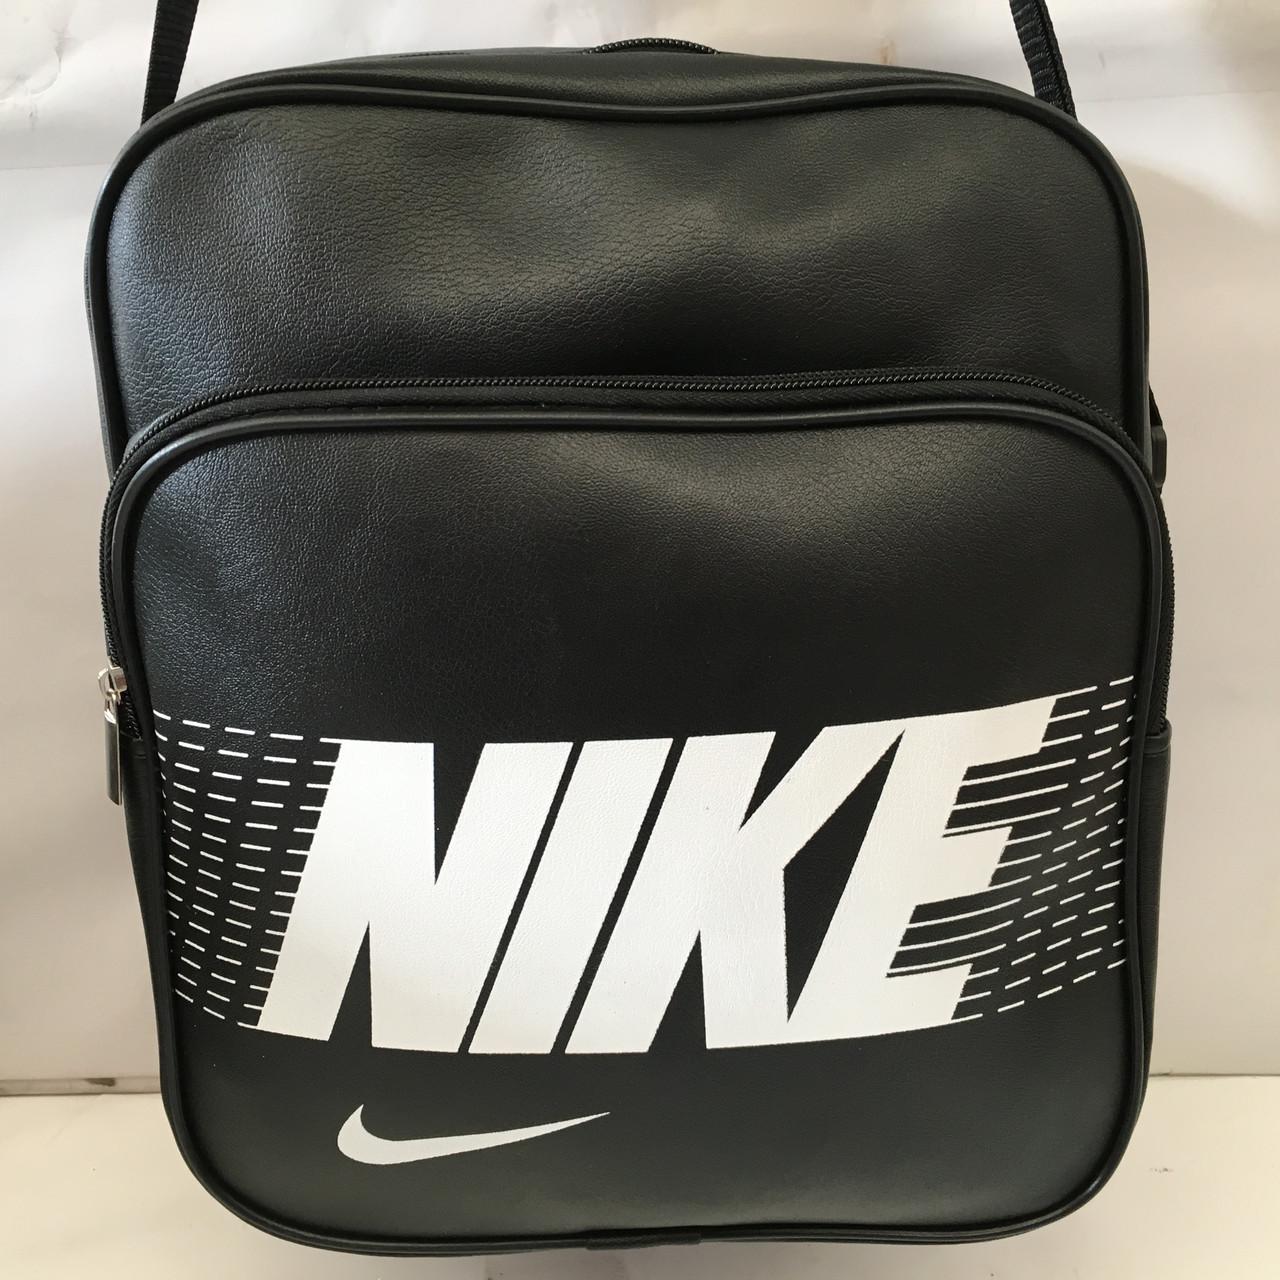 635d621f Спортивная сумка Nike через плечо формат а4 черная оптом : продажа ...